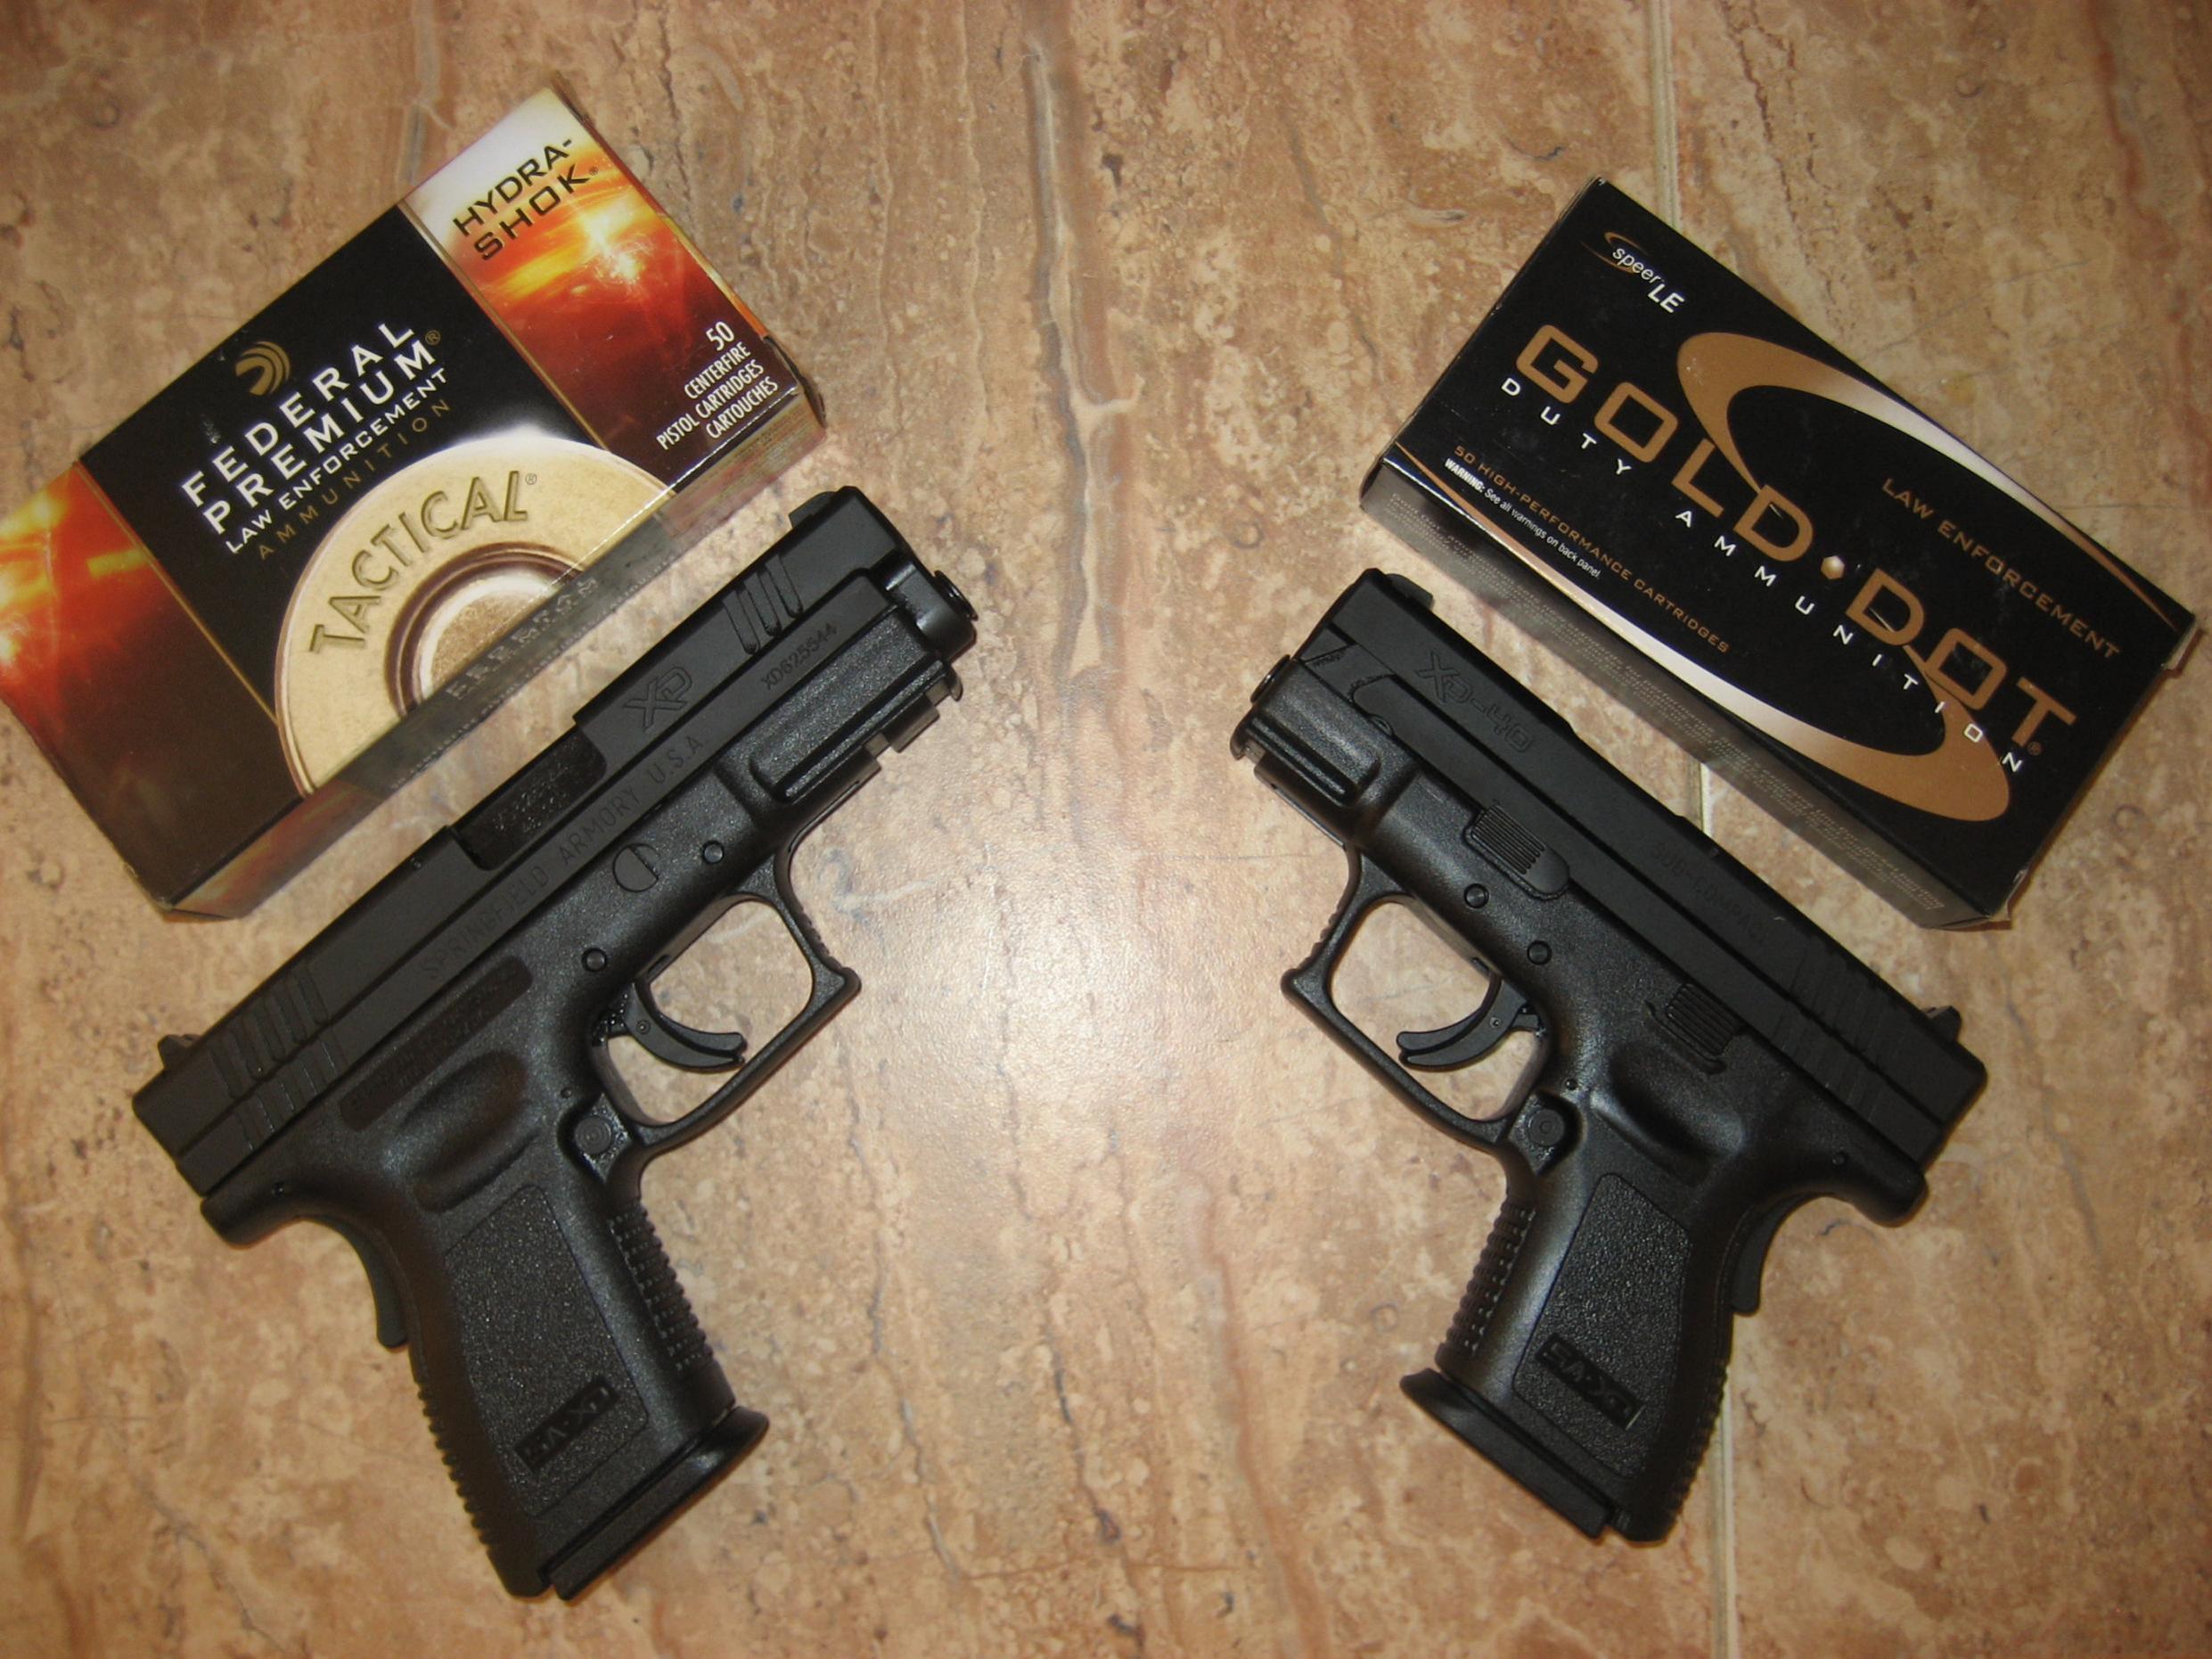 Glock Glock Glock Glock Glock Glock-img_3354.jpg